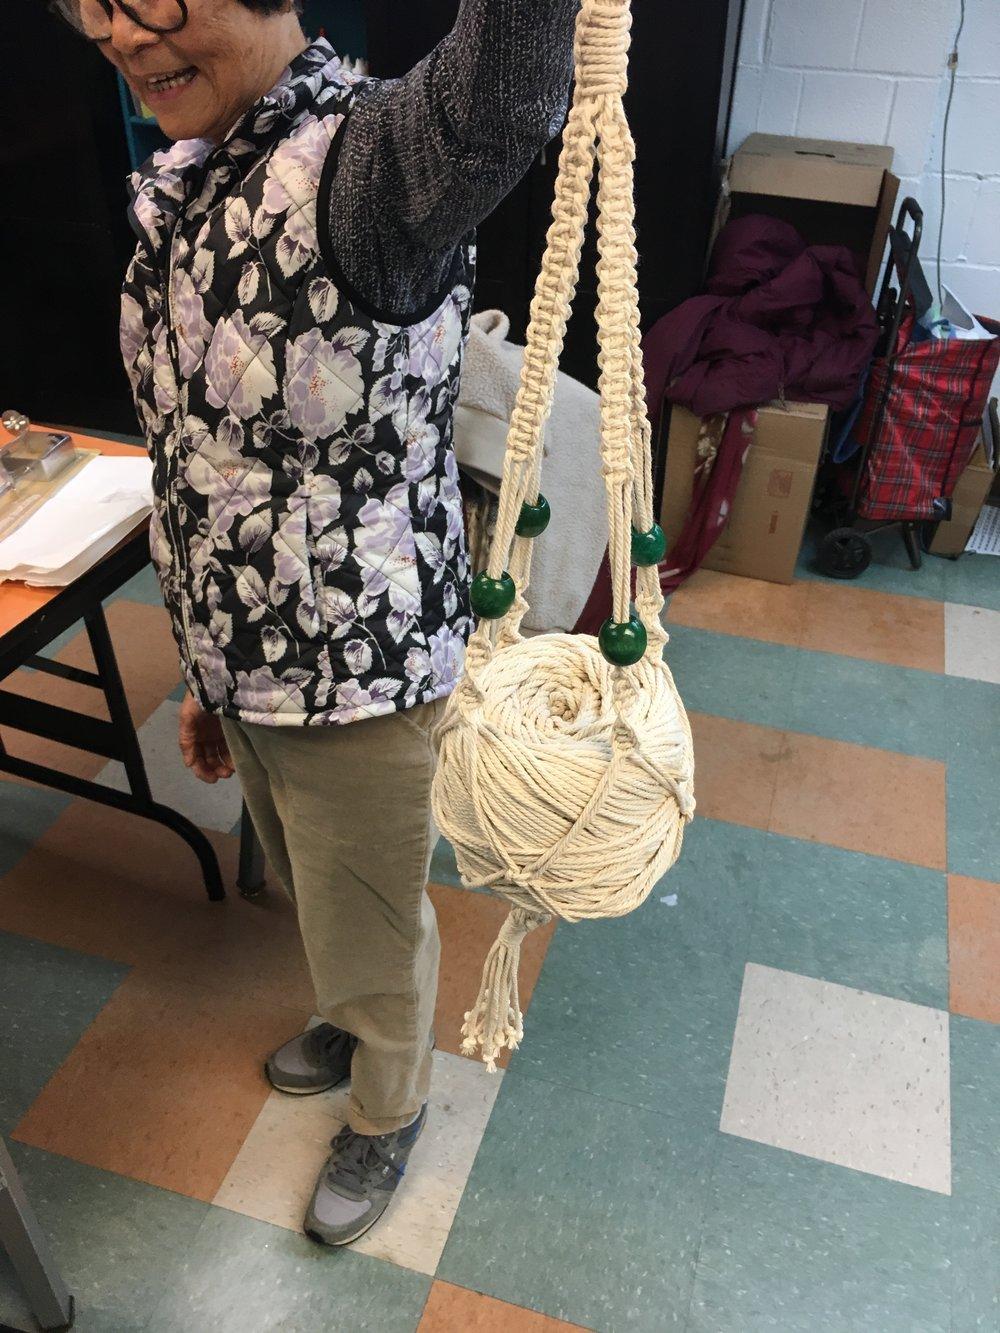 Week 5: A finished plant hanger!